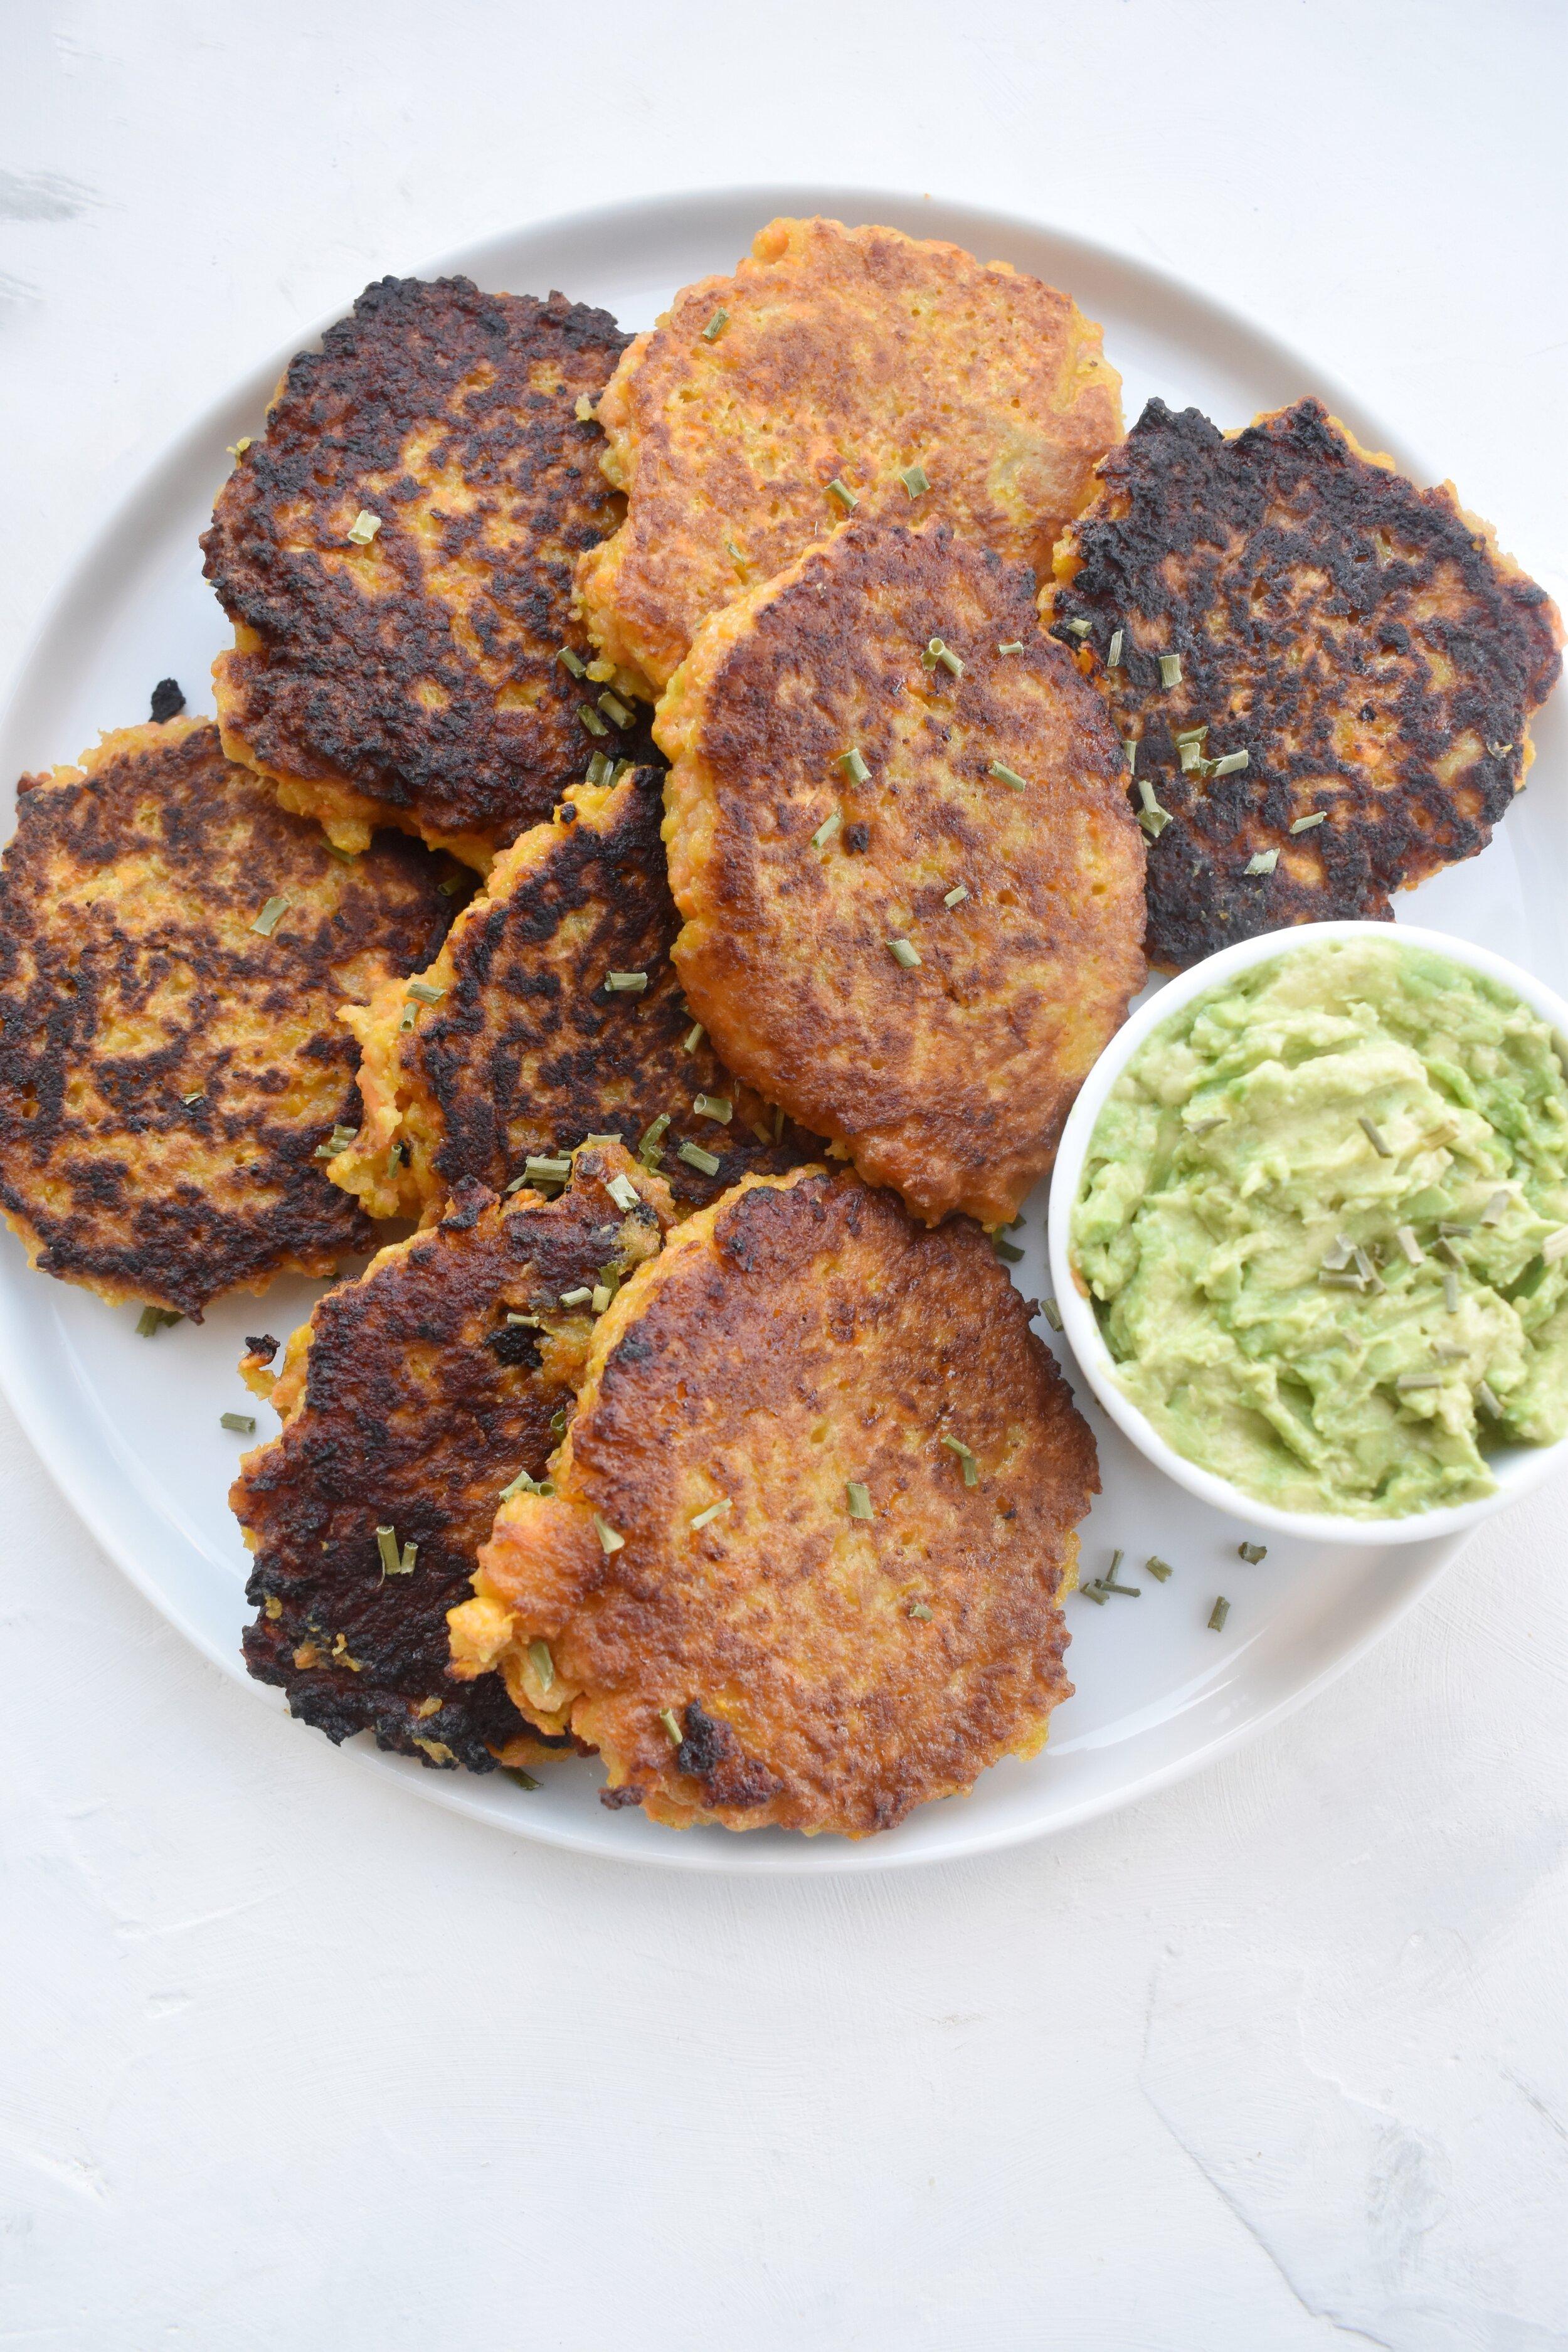 Savory Sweet Potato Pancakes Sammi Haber Brondo Sammi Brondo Nyc Based Registered Dietitian Nutritionist